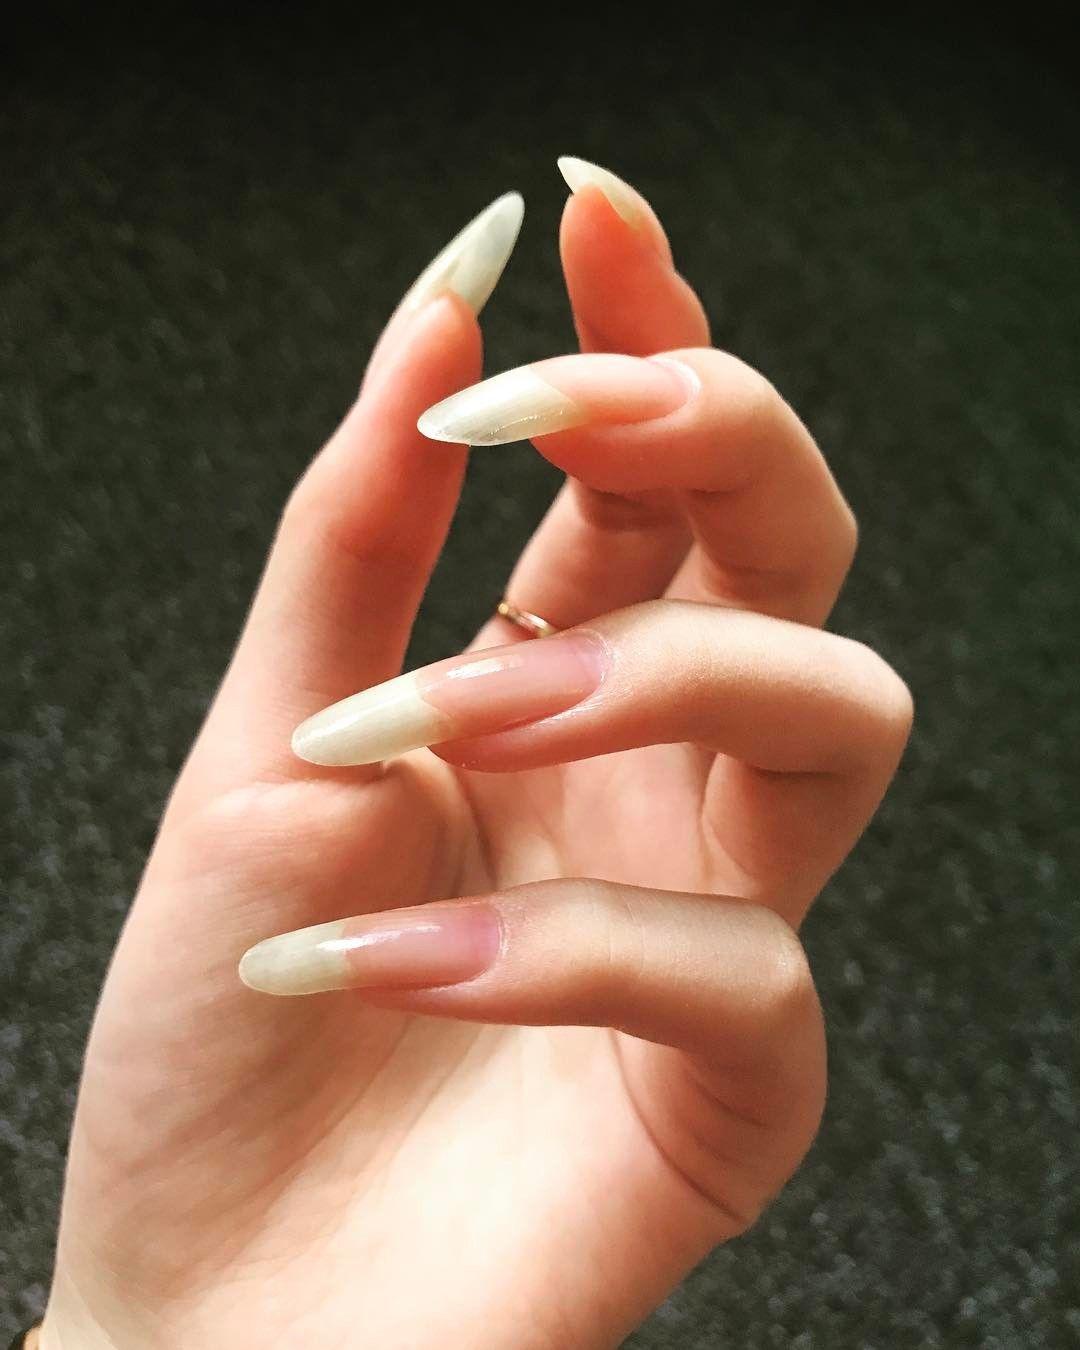 longnaturalnails #longnails #fingers #nails #nailsarts #nautralcolor ...